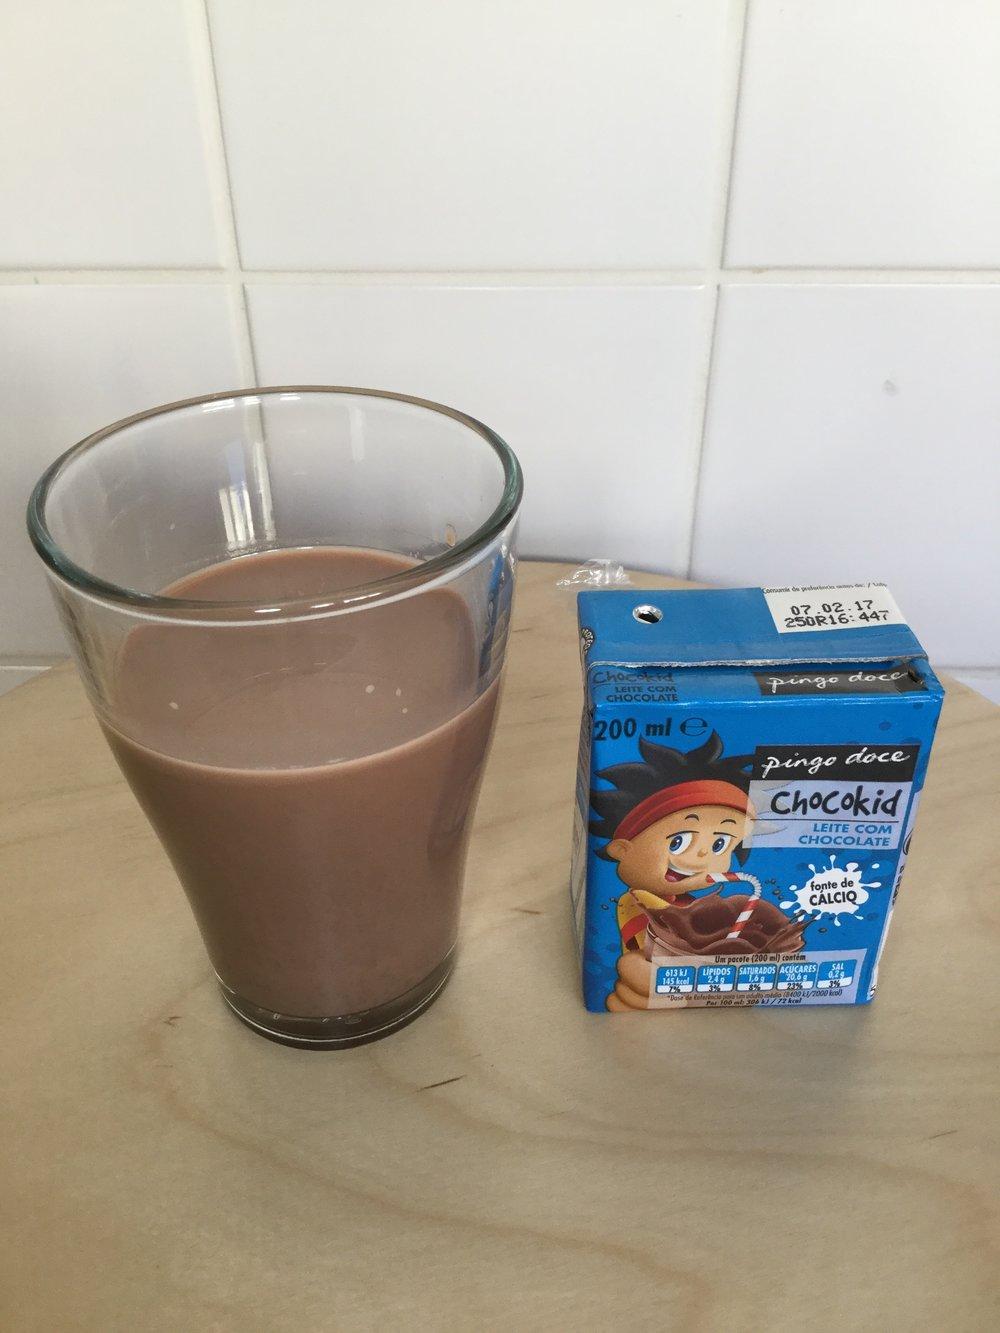 Pingo Doce Chocokid Leite Com Chocolate Cup